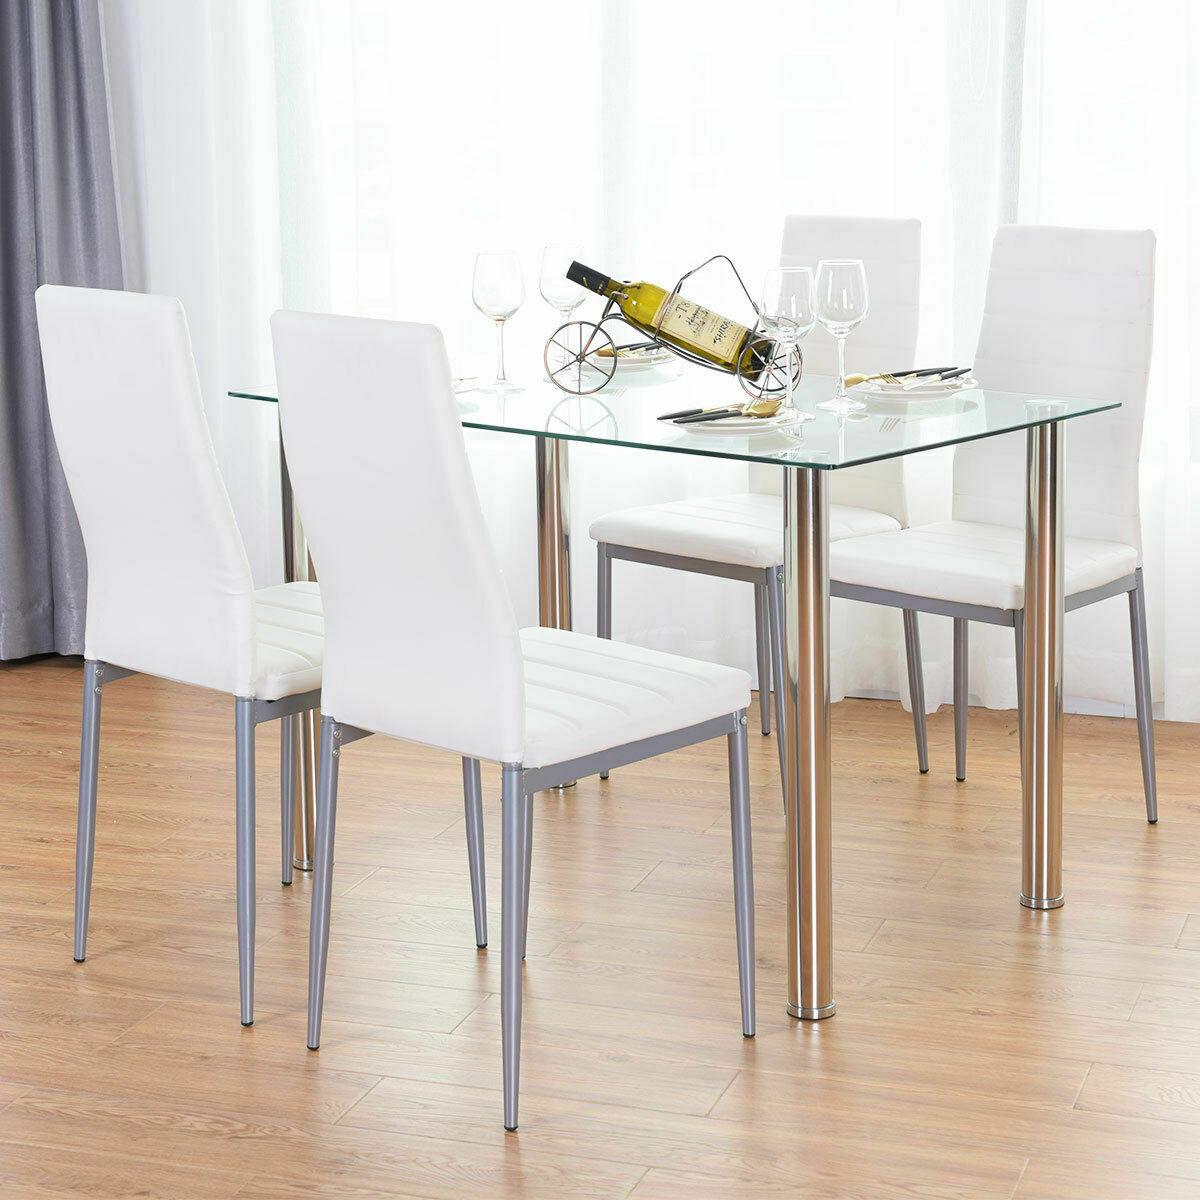 Incredible Details About 5 Piece Dining Table Set White 4 Chair Glass Metal Kitchen Dining Room Breakfast Inzonedesignstudio Interior Chair Design Inzonedesignstudiocom